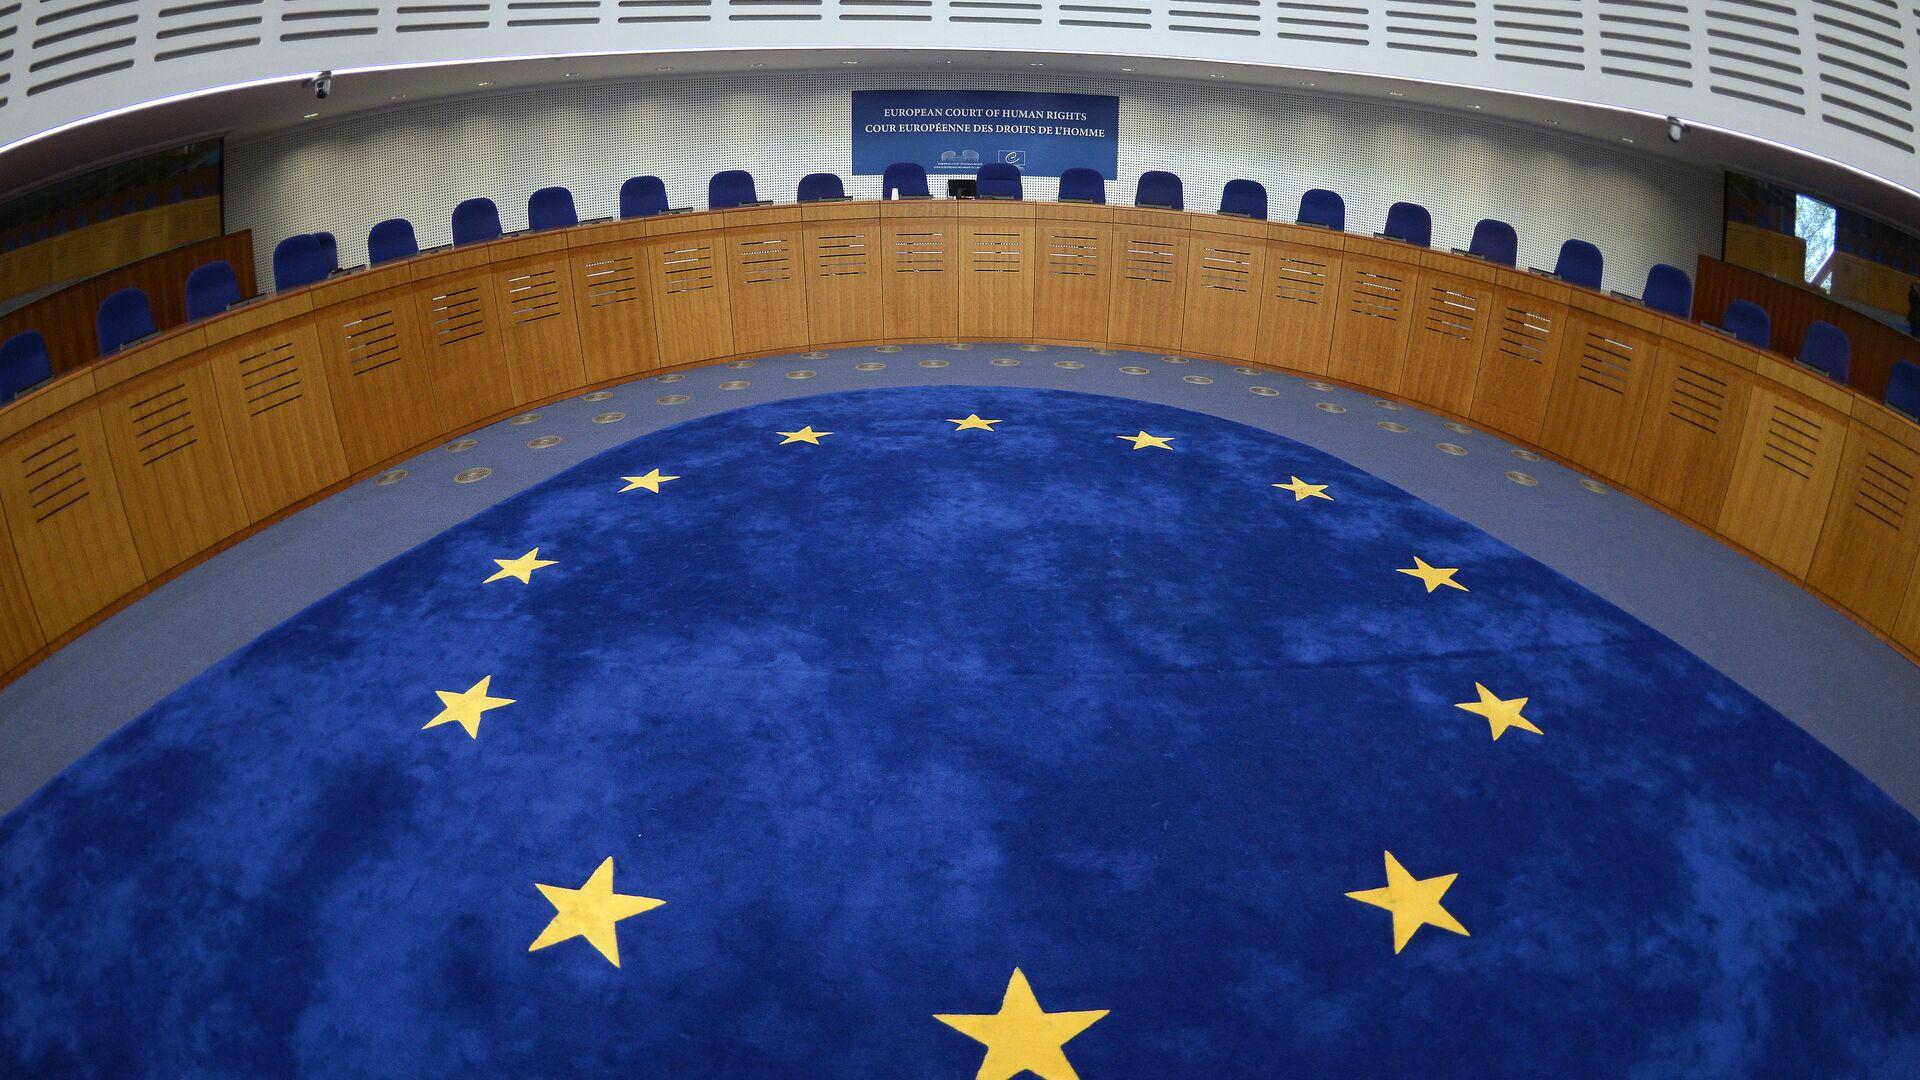 Tribunal Europeo de Derechos Humanos en Estrasburgo - Sputnik Mundo, 1920, 02.02.2021